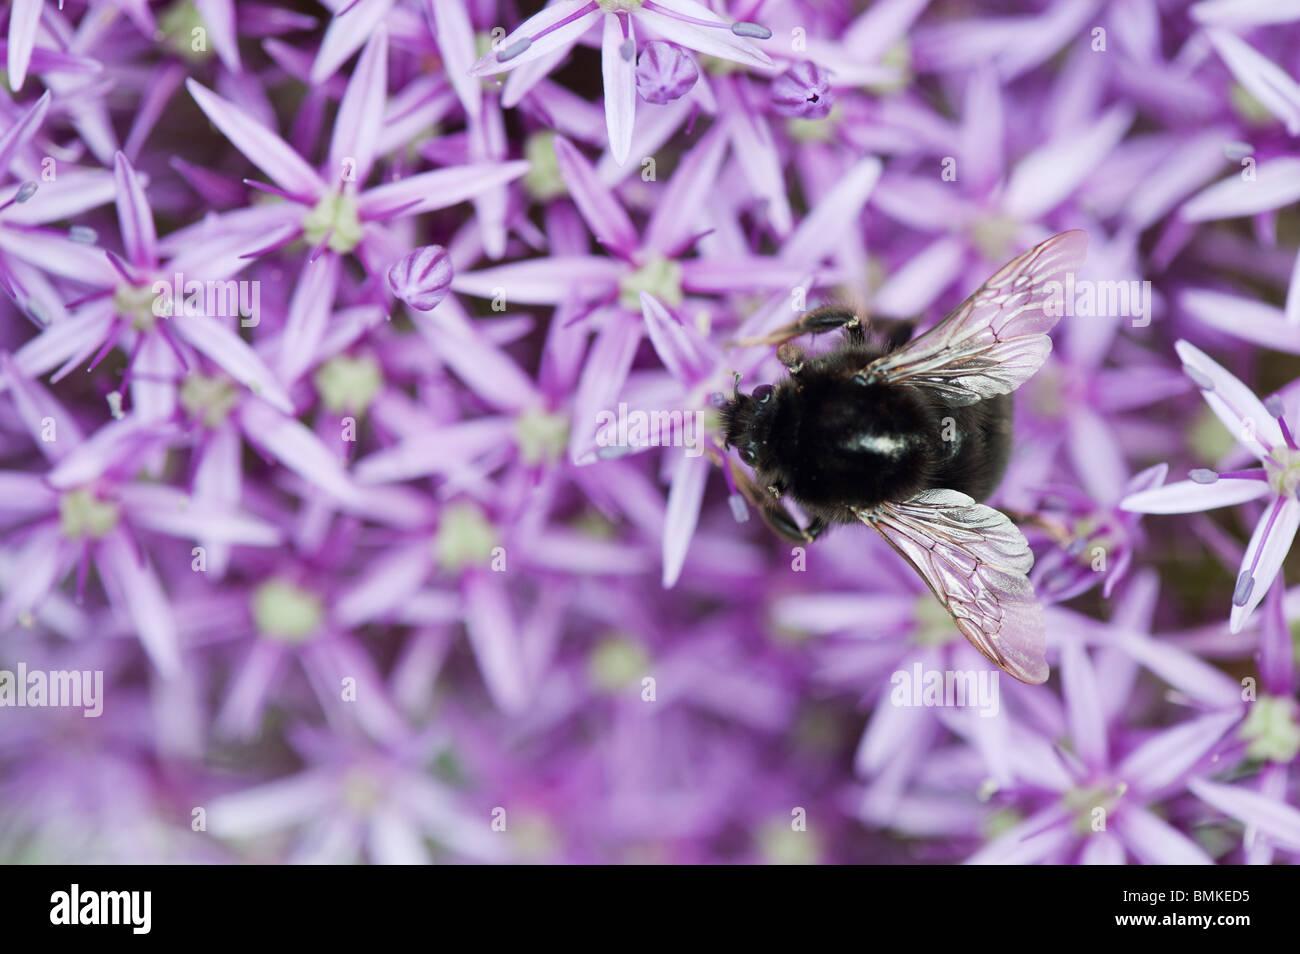 Bumble bee feeding on Allium globemaster flower - Stock Image